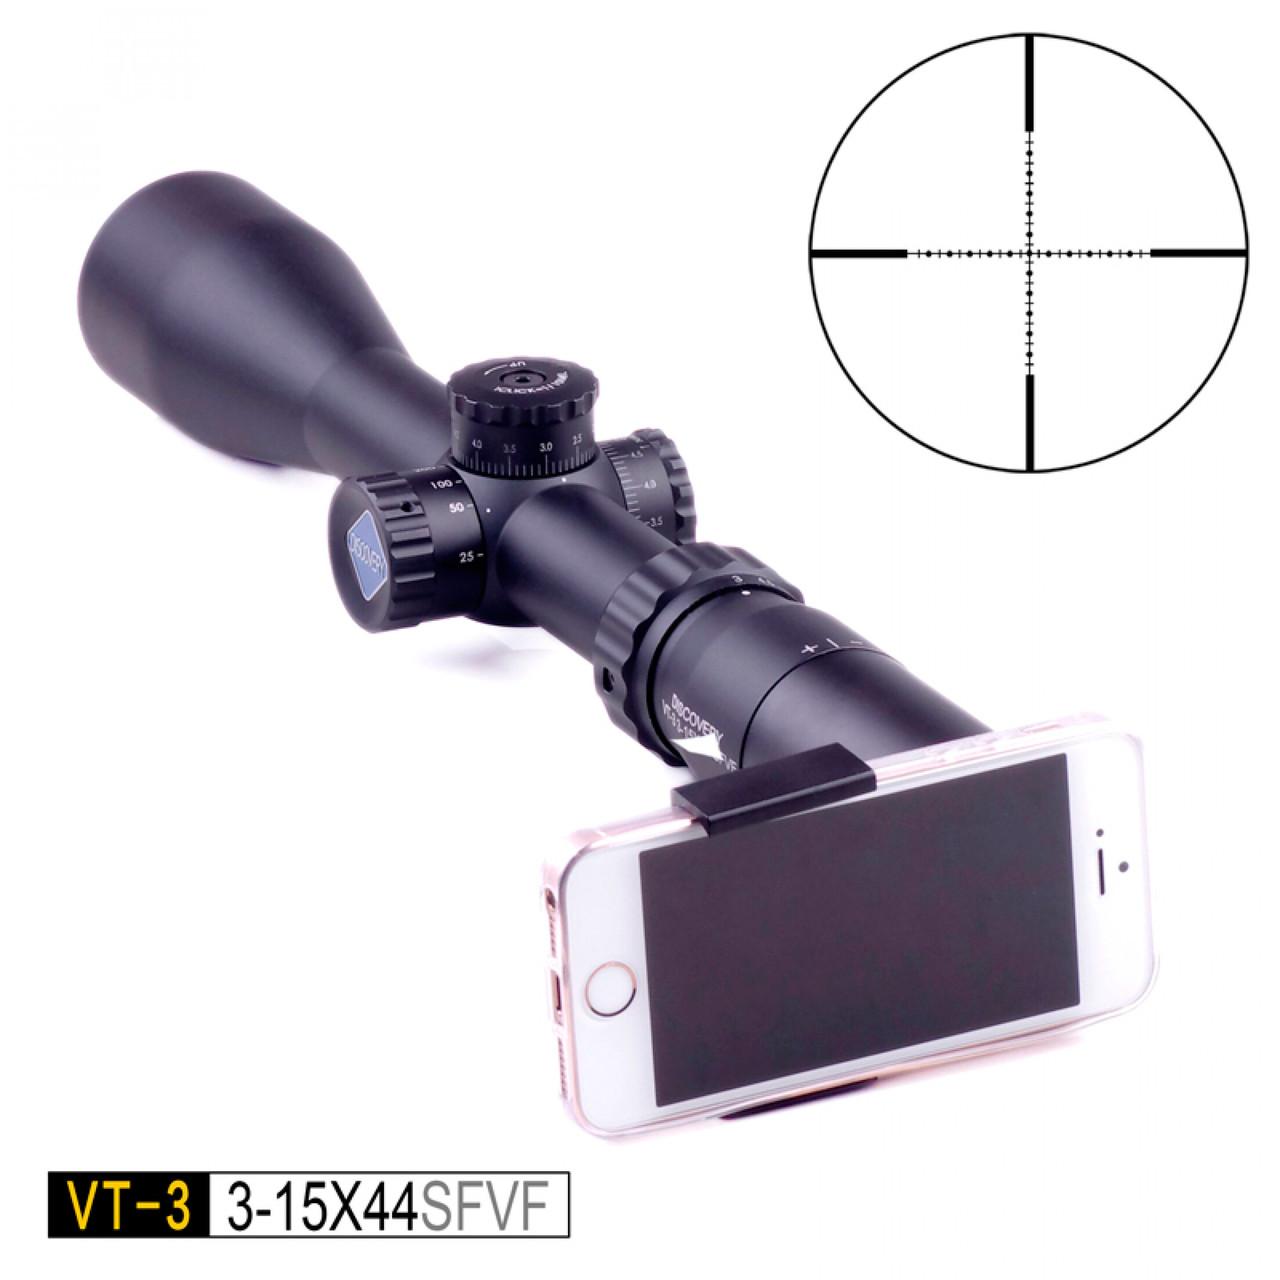 Приціл оптичний VT-3 SFP 3-15х44 SFVF-DISCOVERY